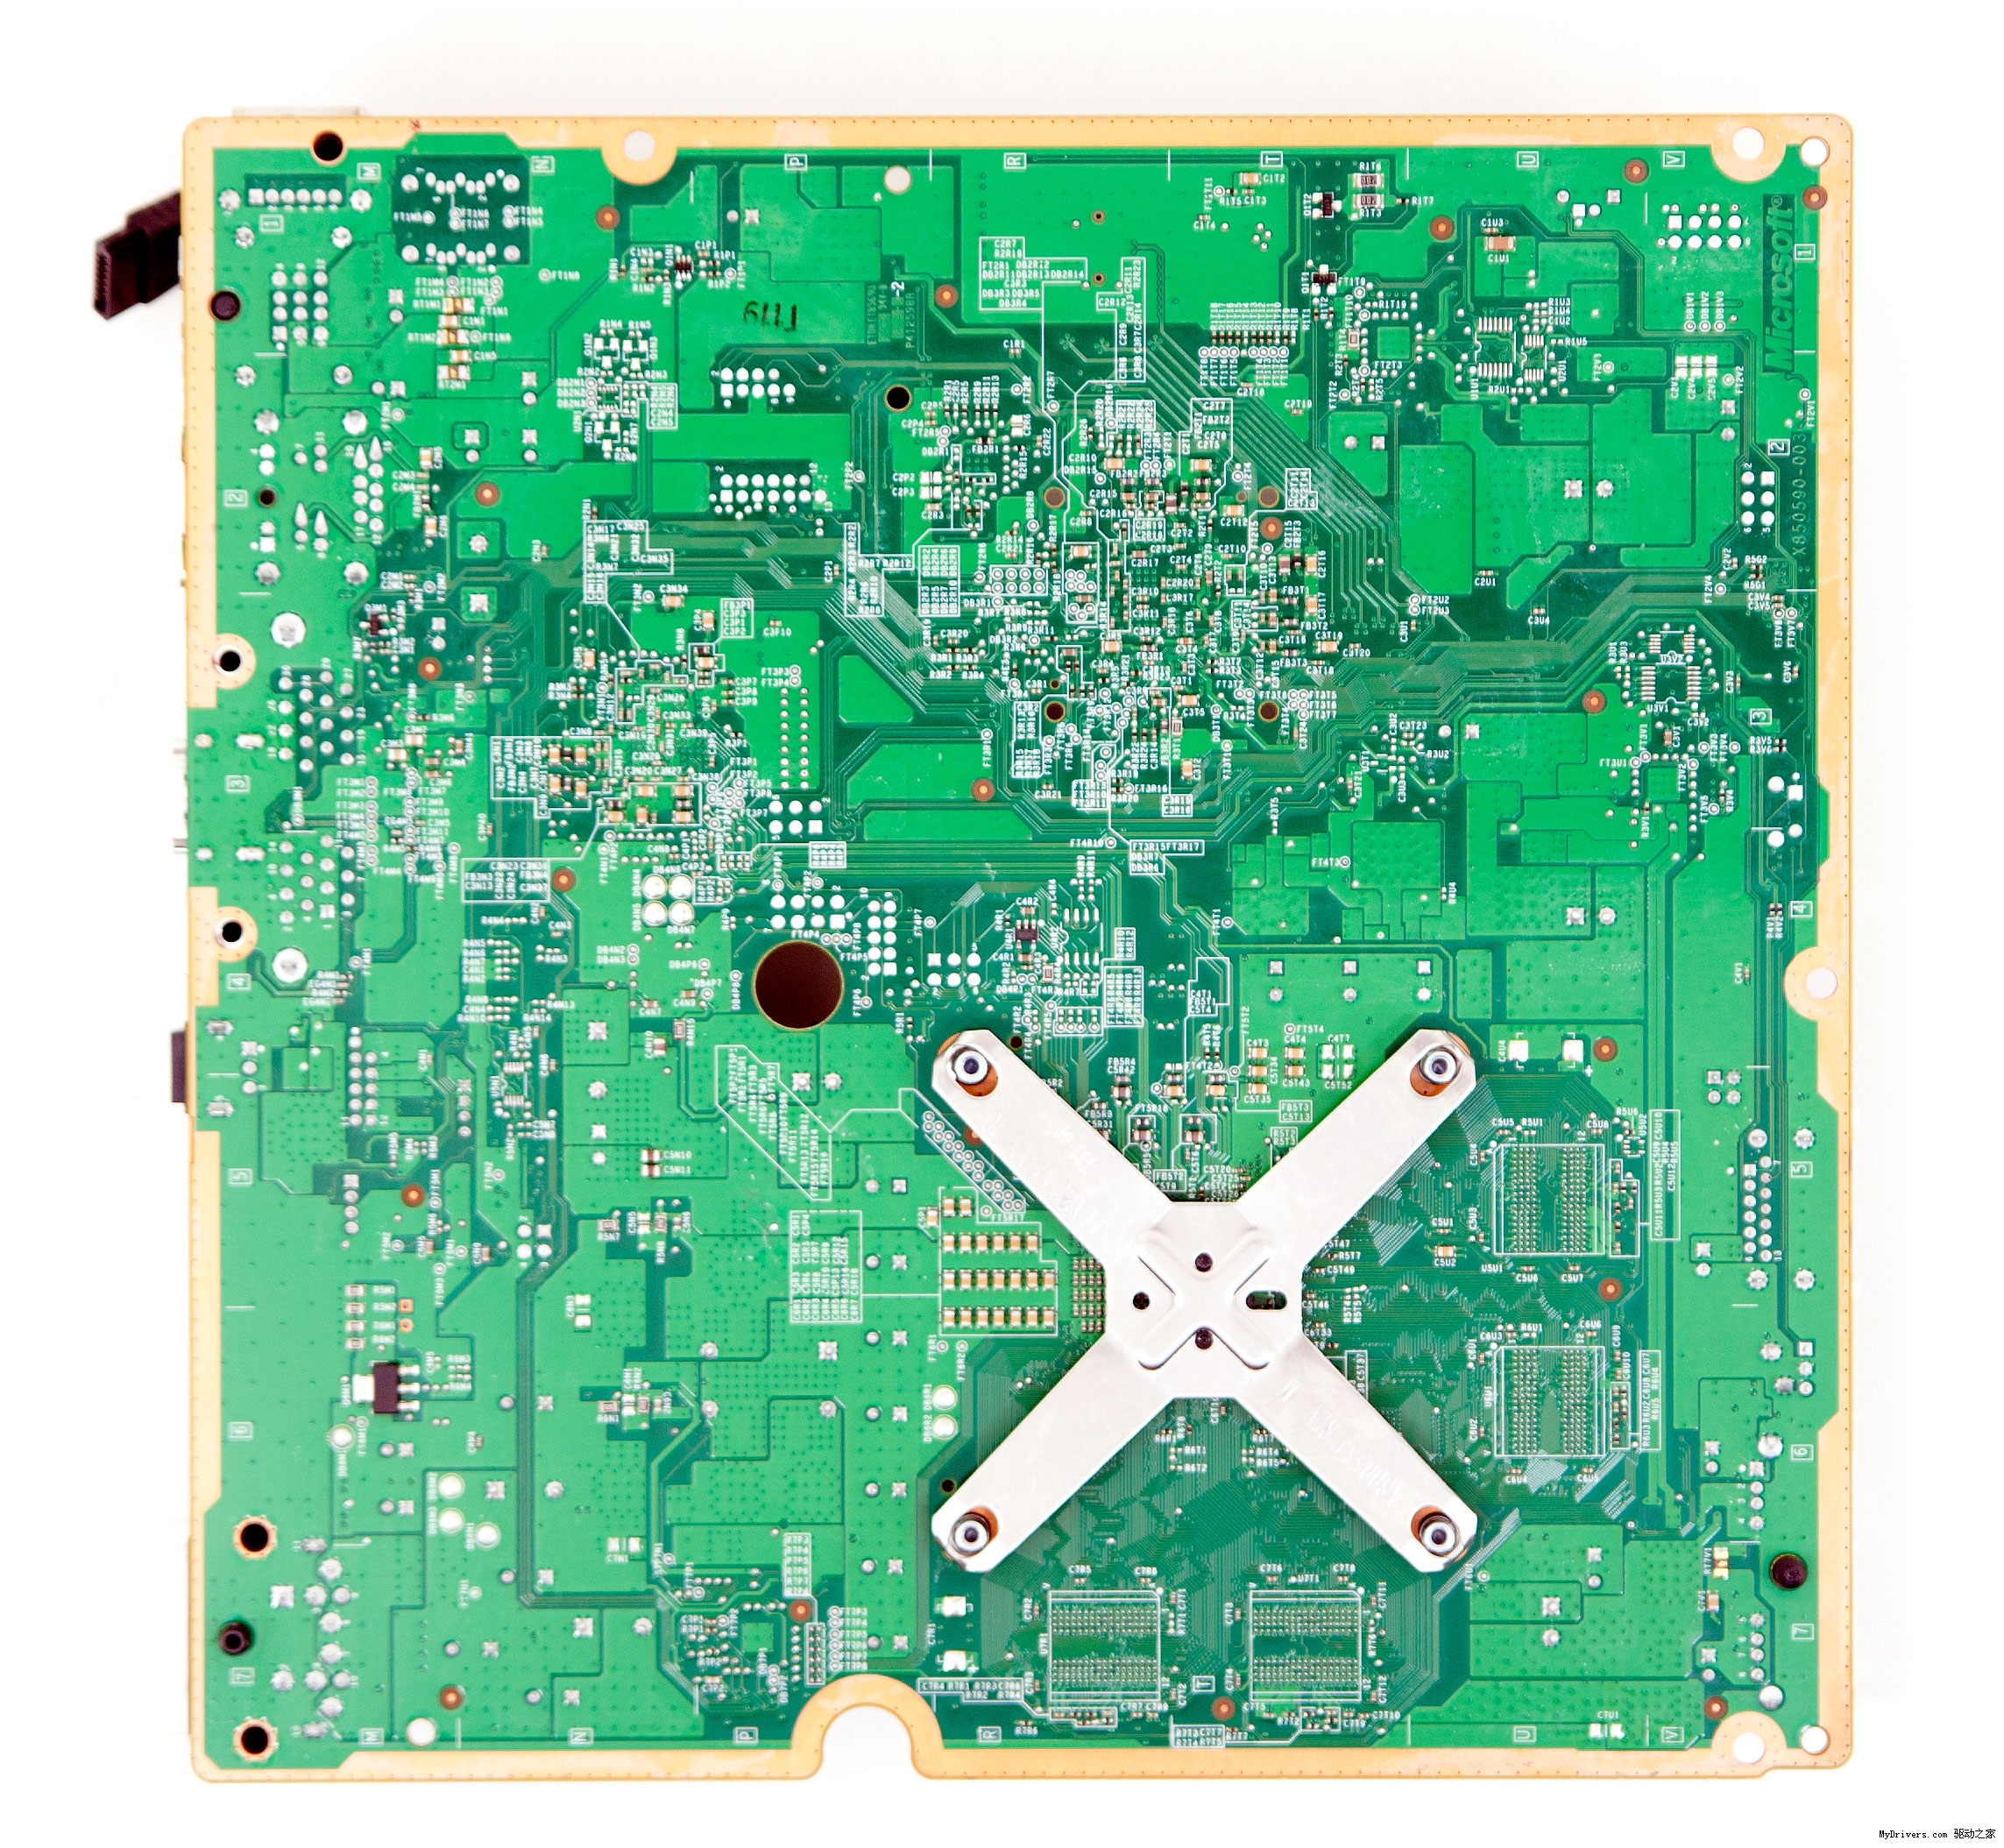 xbox 360新款轻薄版整机 拆解对比超海量图赏 xbox360综合高清图片